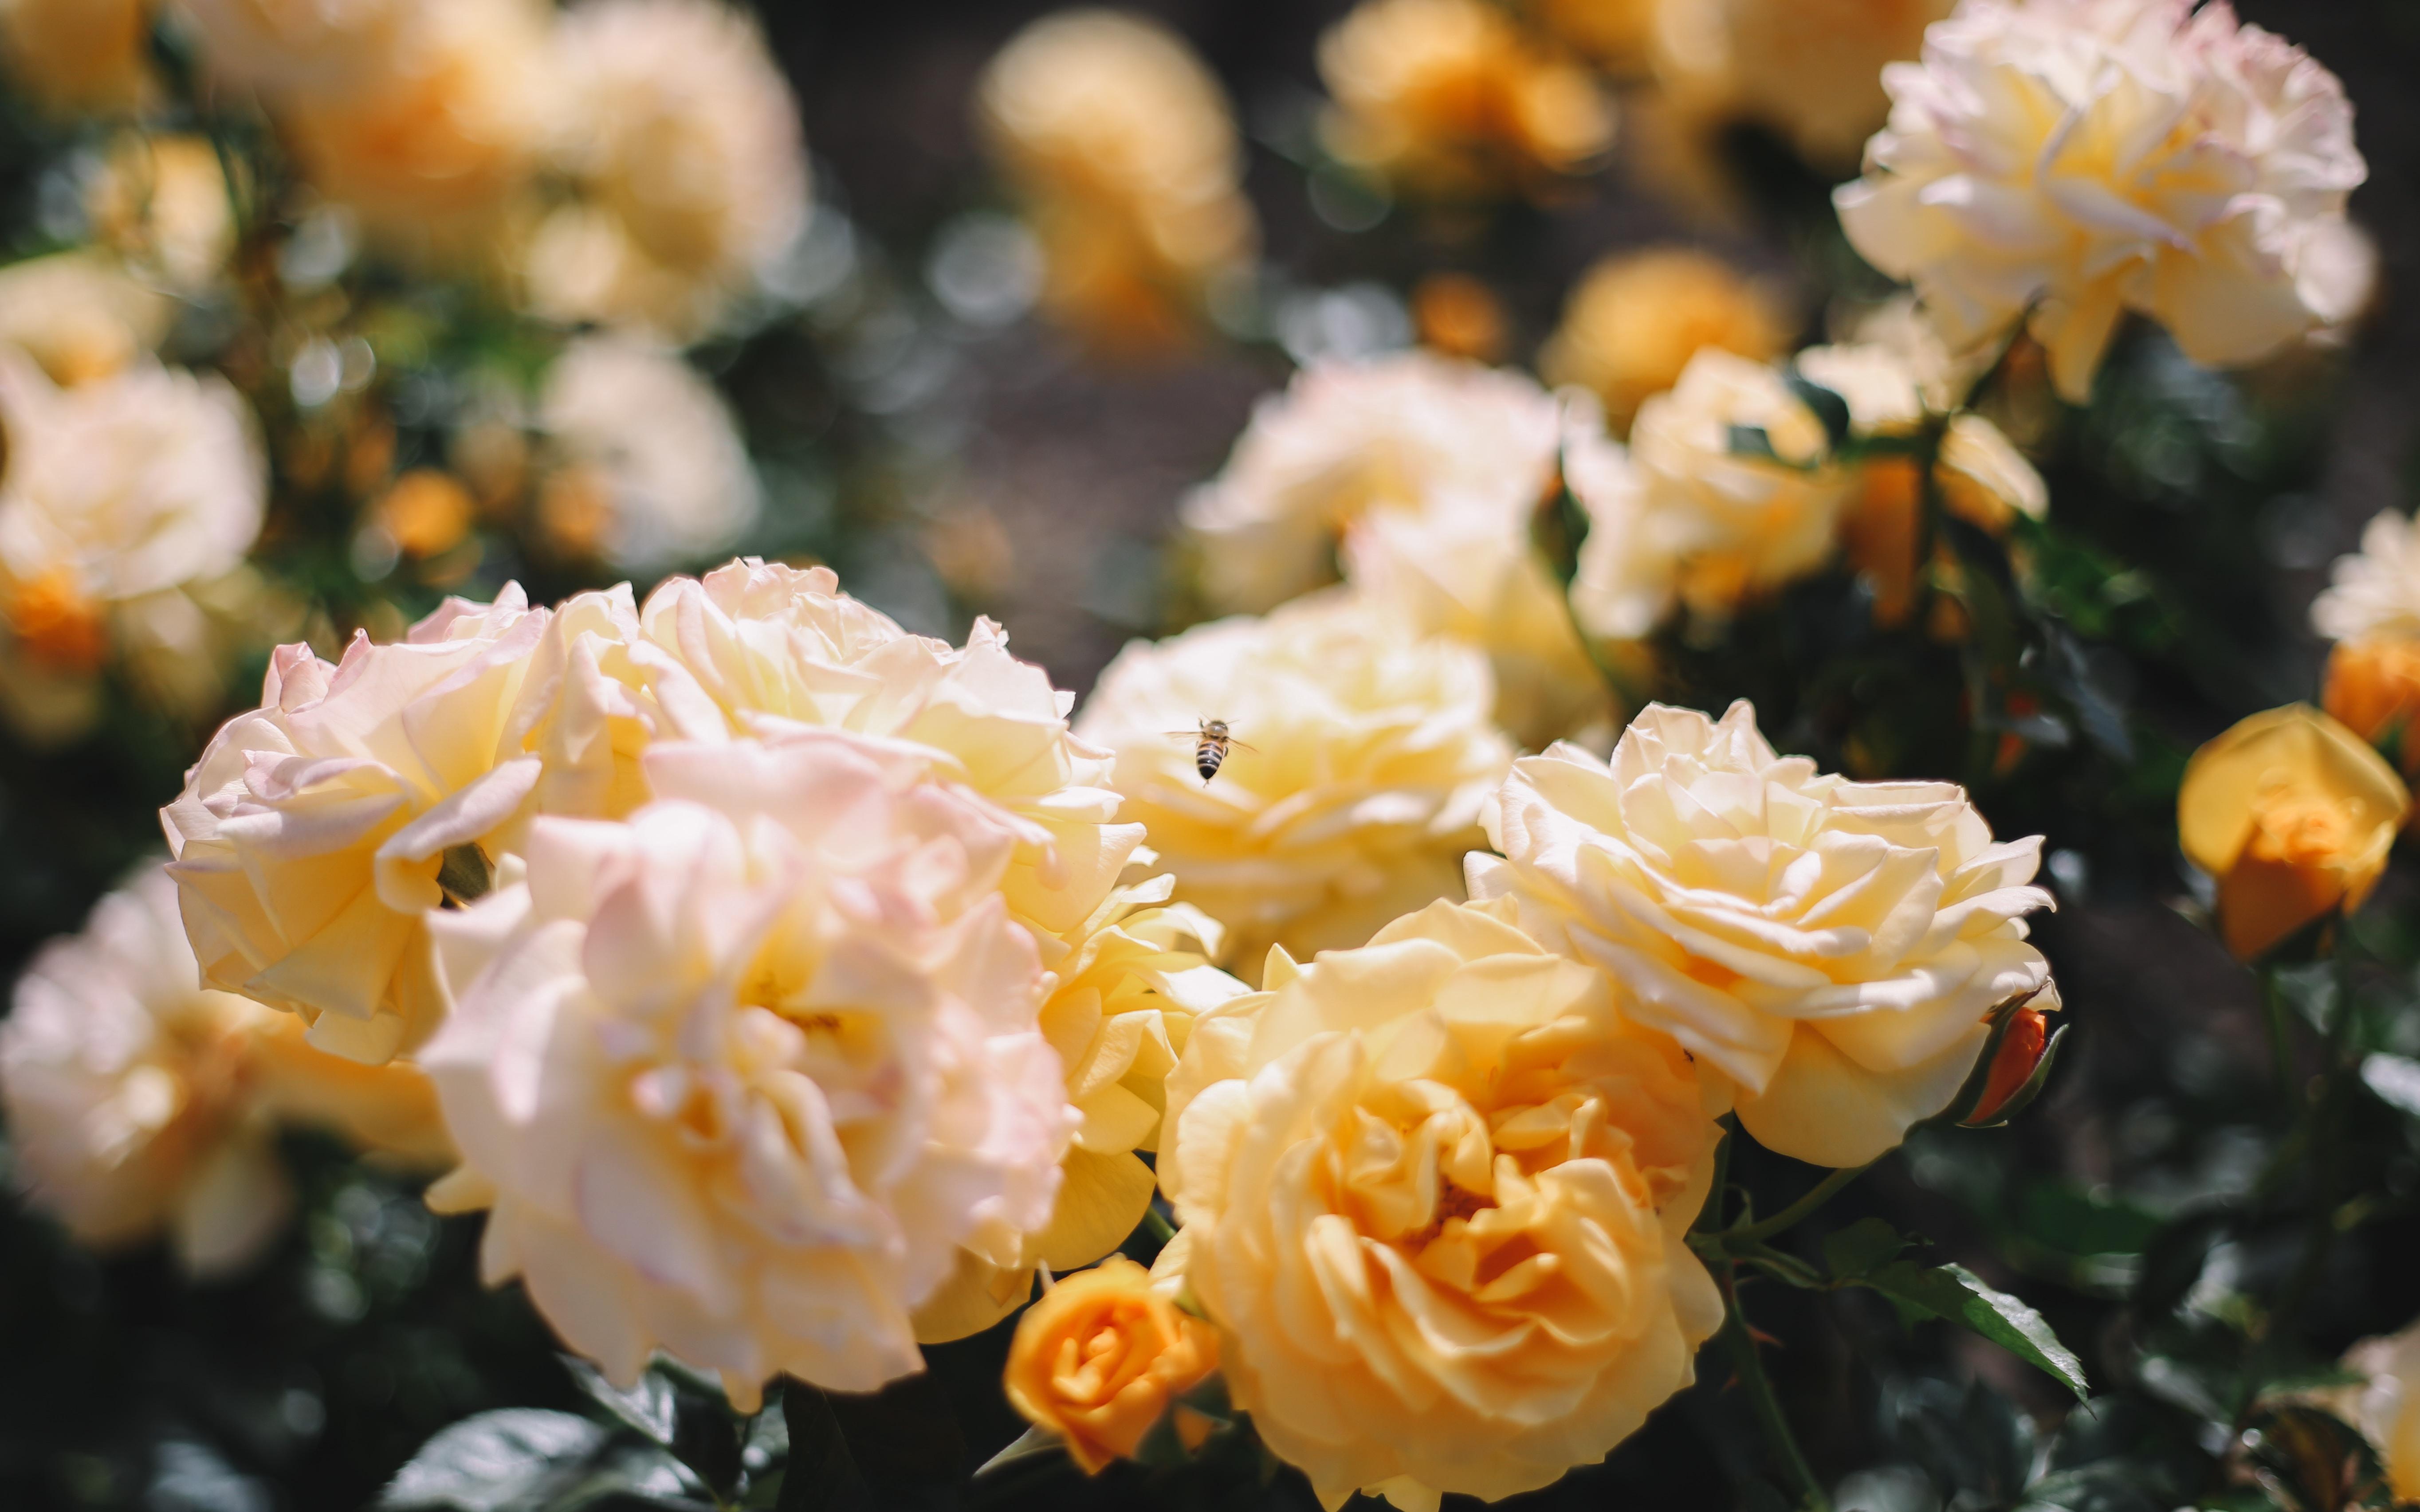 closeup photo of yellow carnation flower